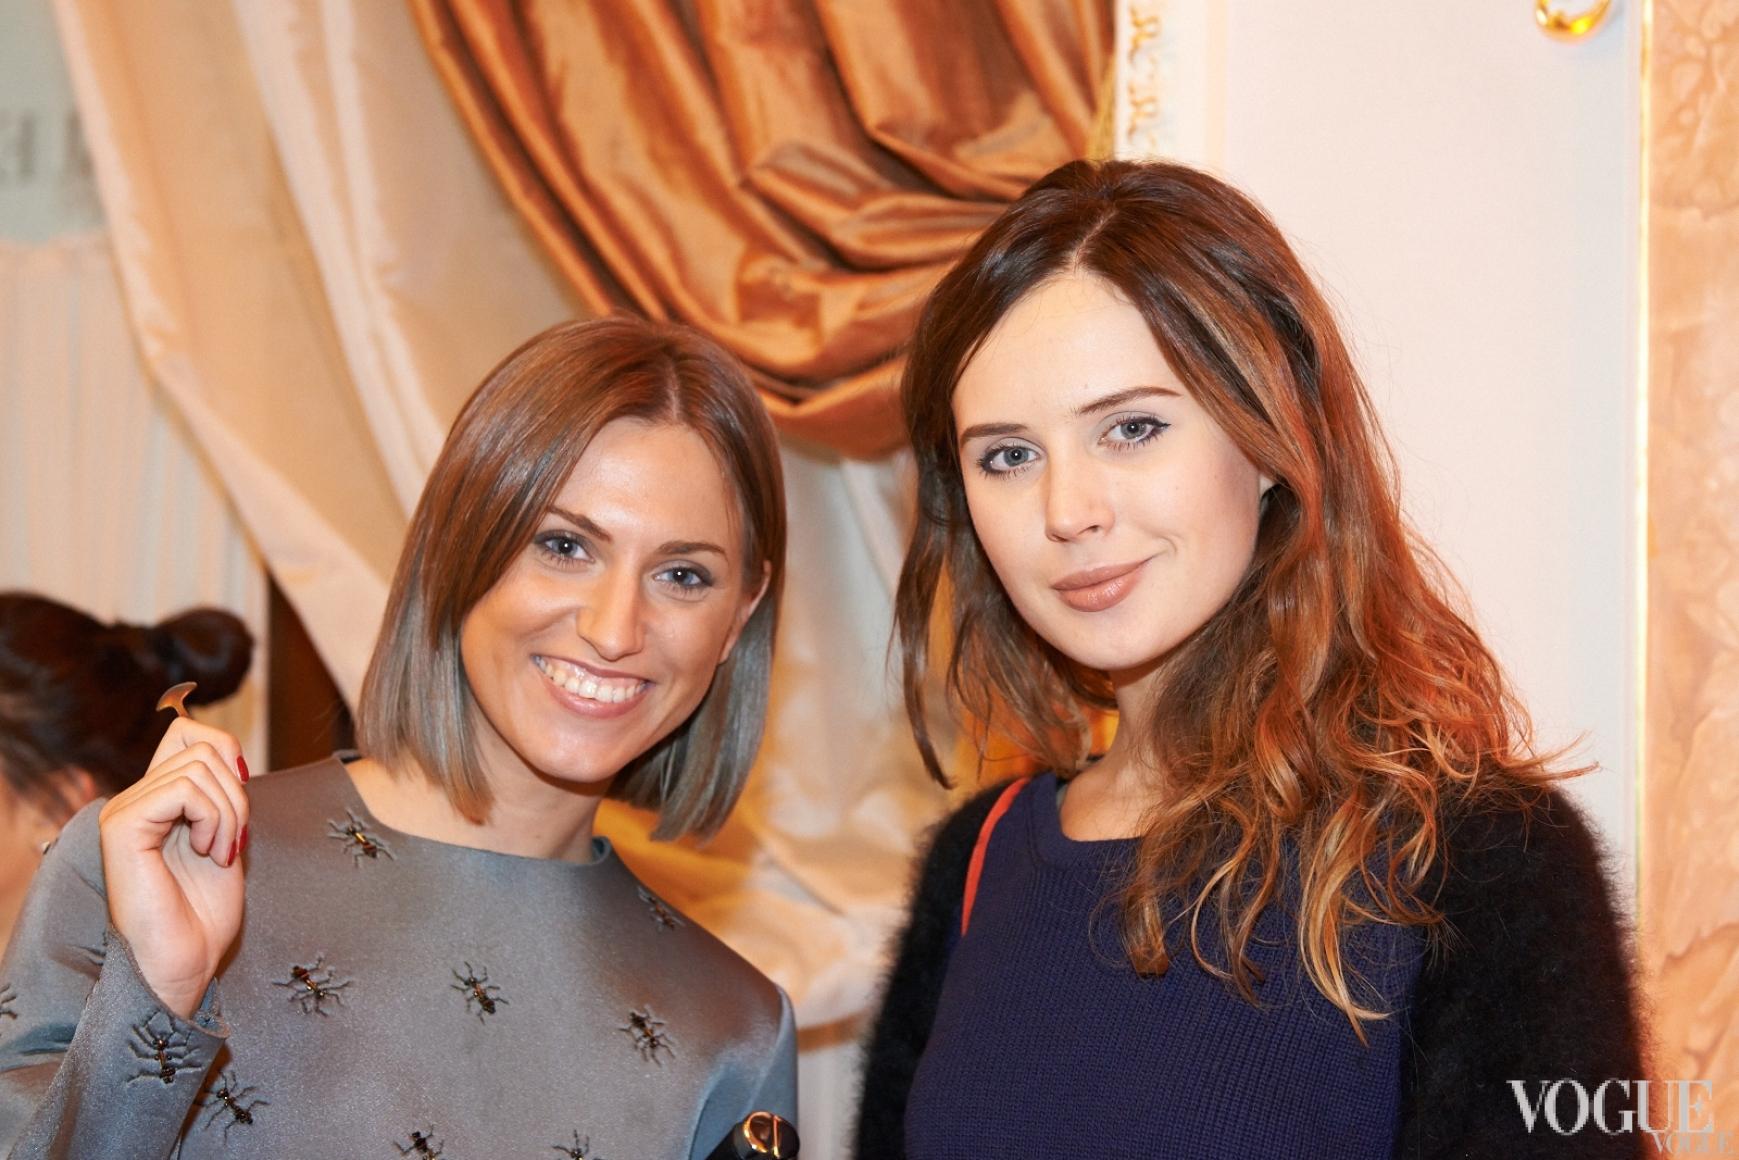 Александра Андрущенко и Катя Марьяш